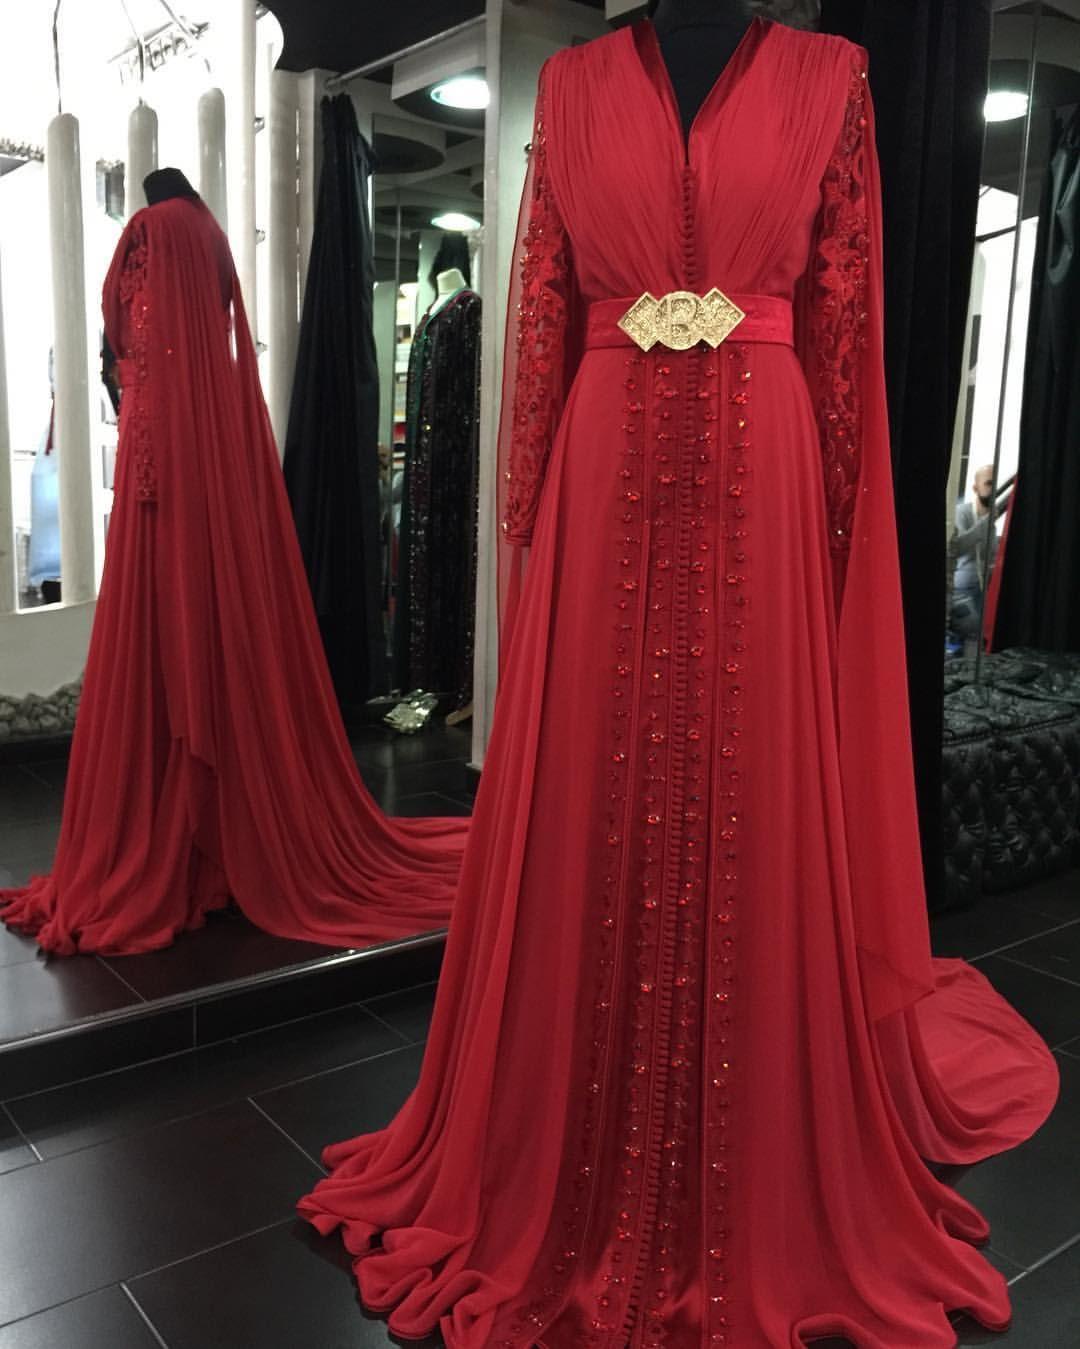 Mi Piace 2 092 Commenti 92 Romeo Couture Officiel Romeo Couture Officiel Su Instagram Romeo Haute Coutur Moroccan Dress Turkish Dress Arab Fashion